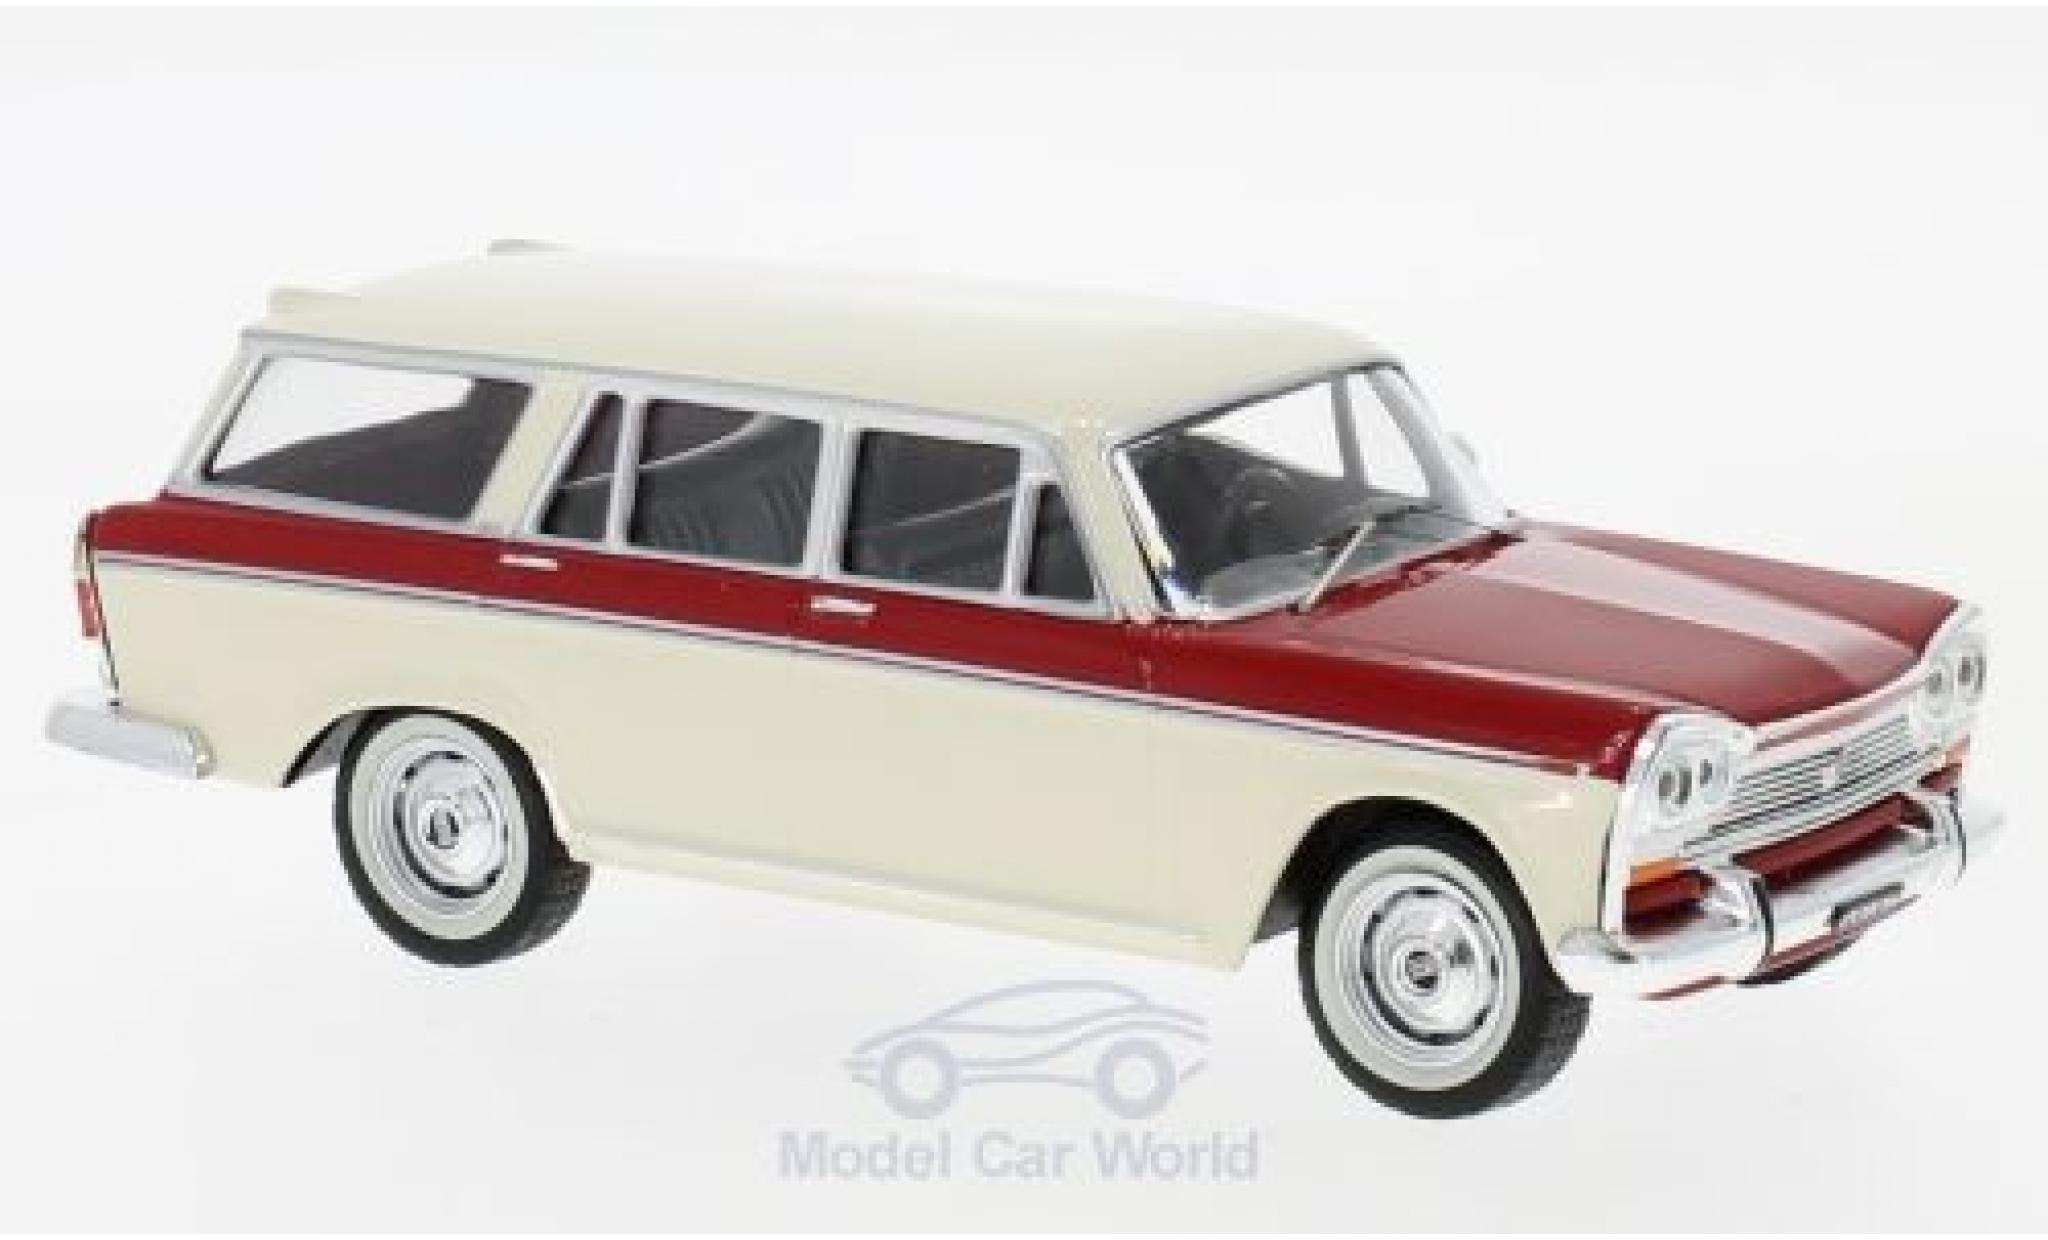 Fiat 2300 1/43 IXO Familiare hellbeige/red 1965